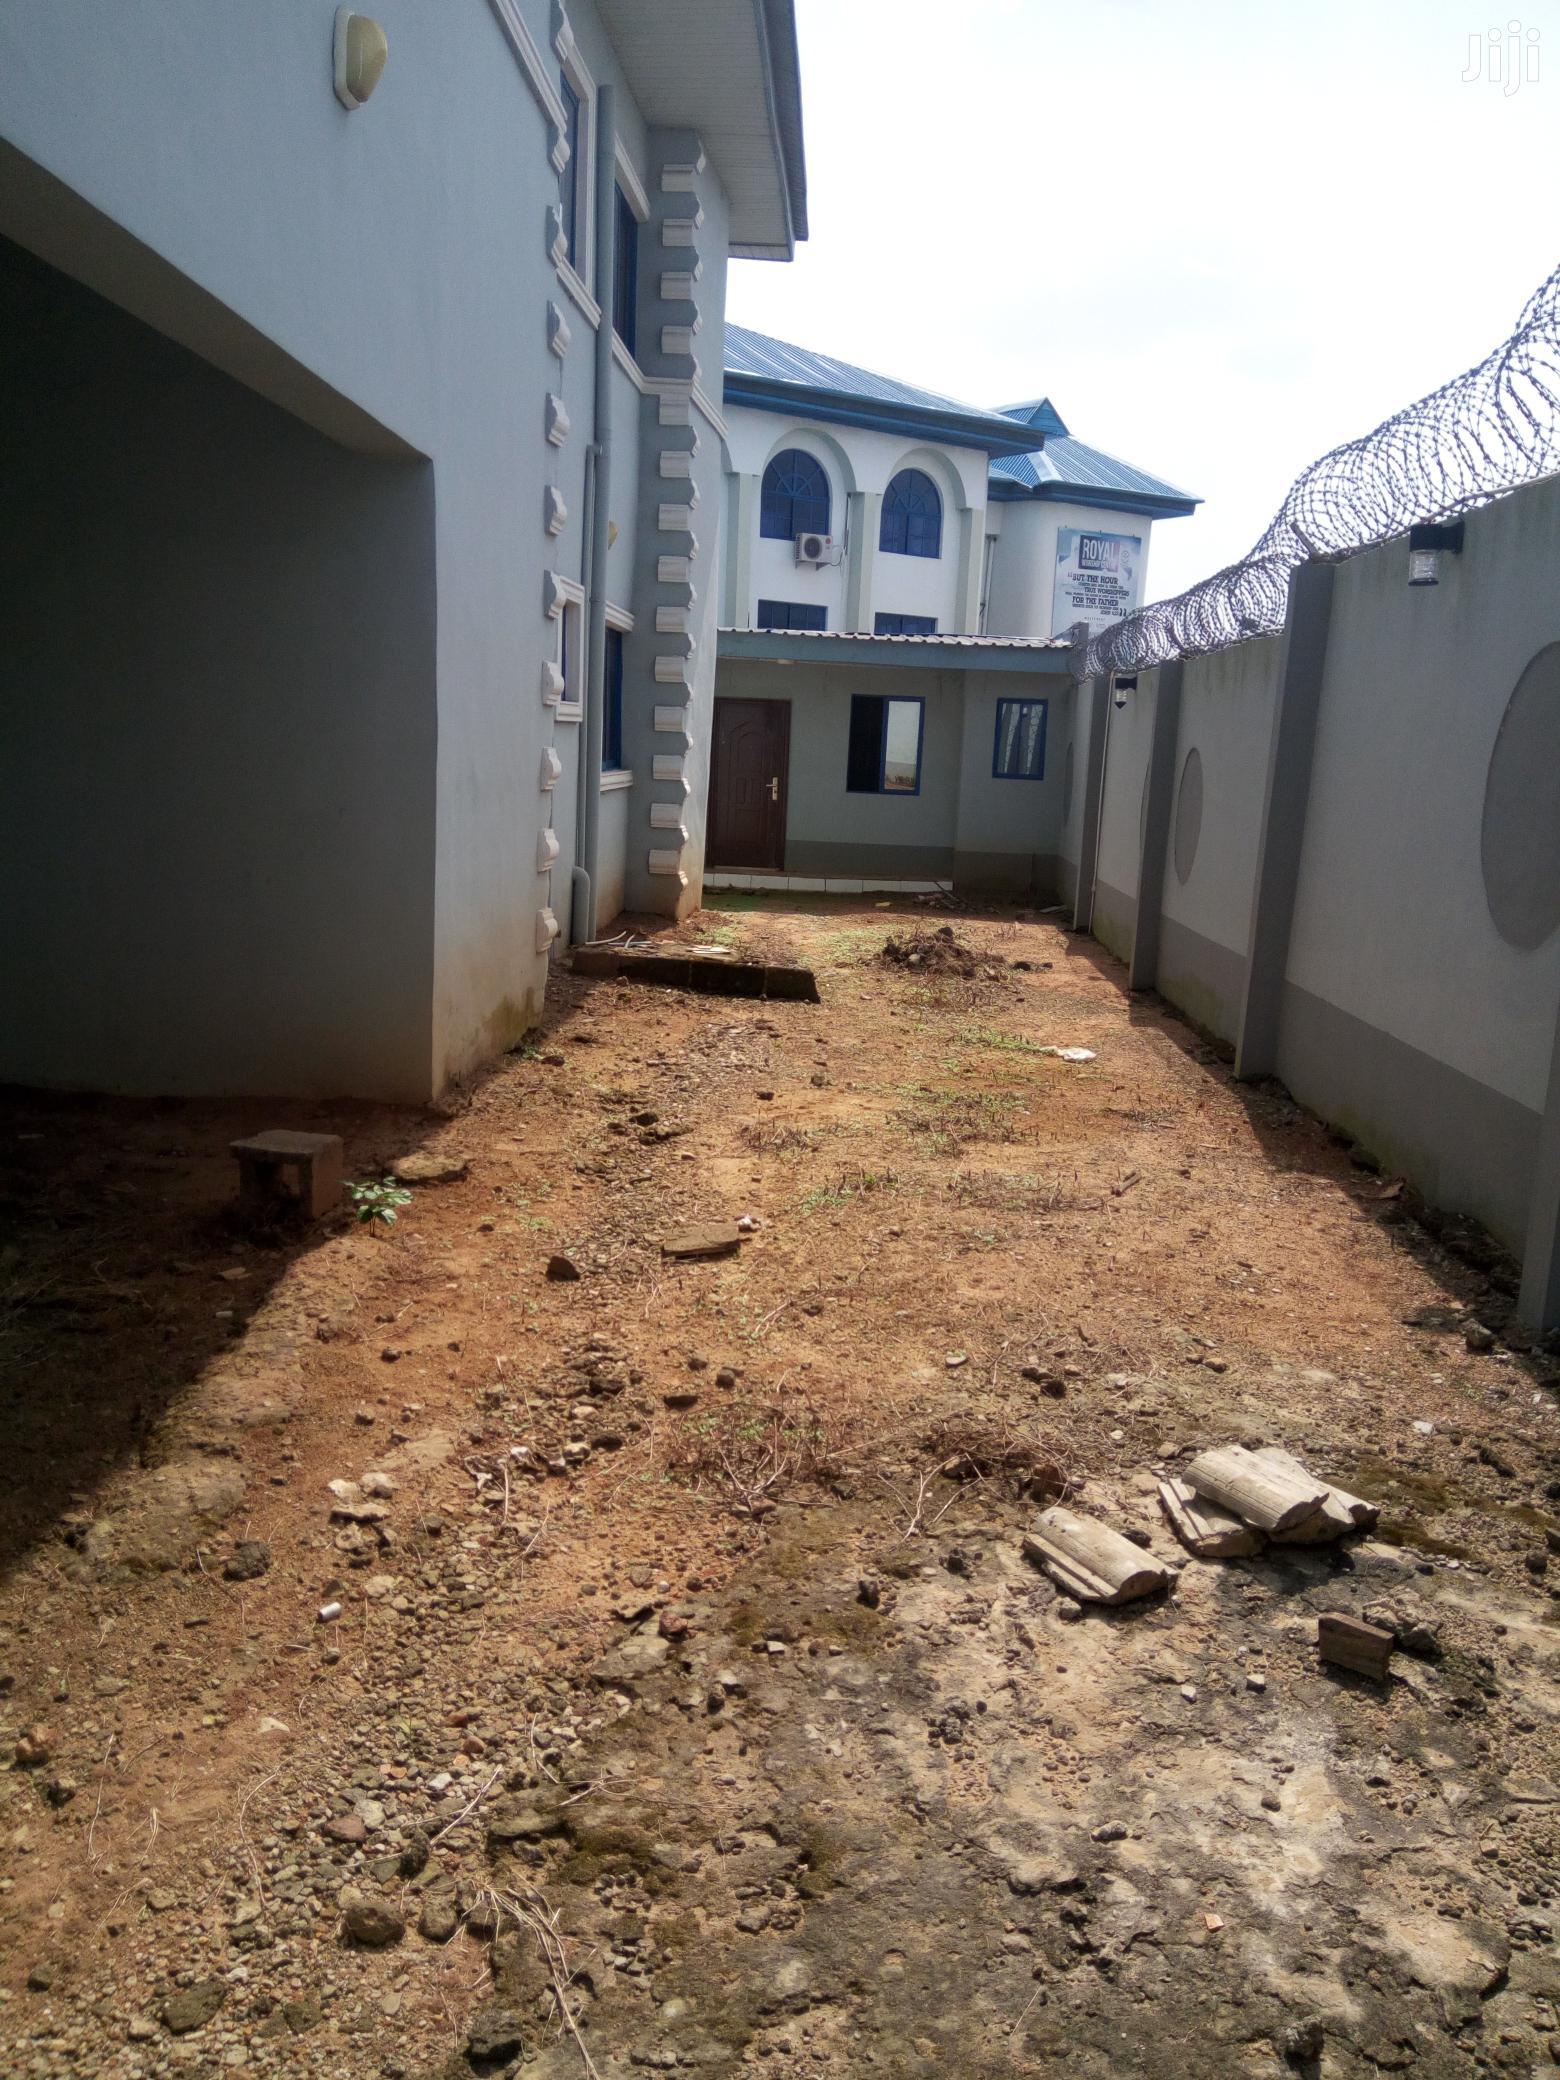 4bdrm Duplex in Agodi Estate., Ibadan for Sale | Houses & Apartments For Sale for sale in Ibadan, Oyo State, Nigeria